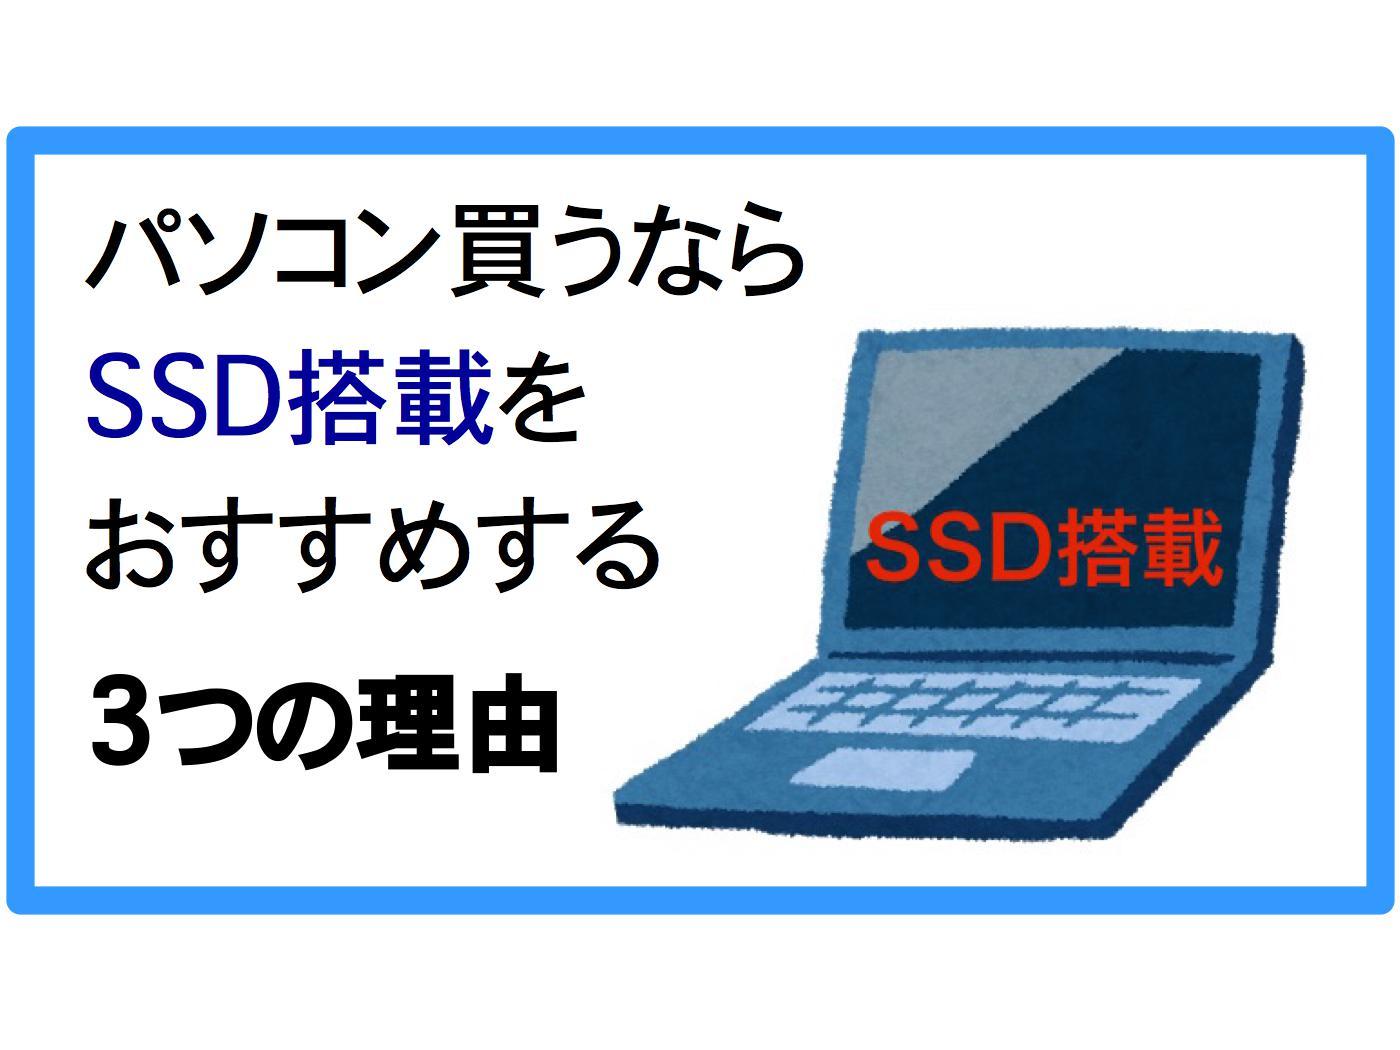 PC づトレージ HDD SSD パソコン 買い替え